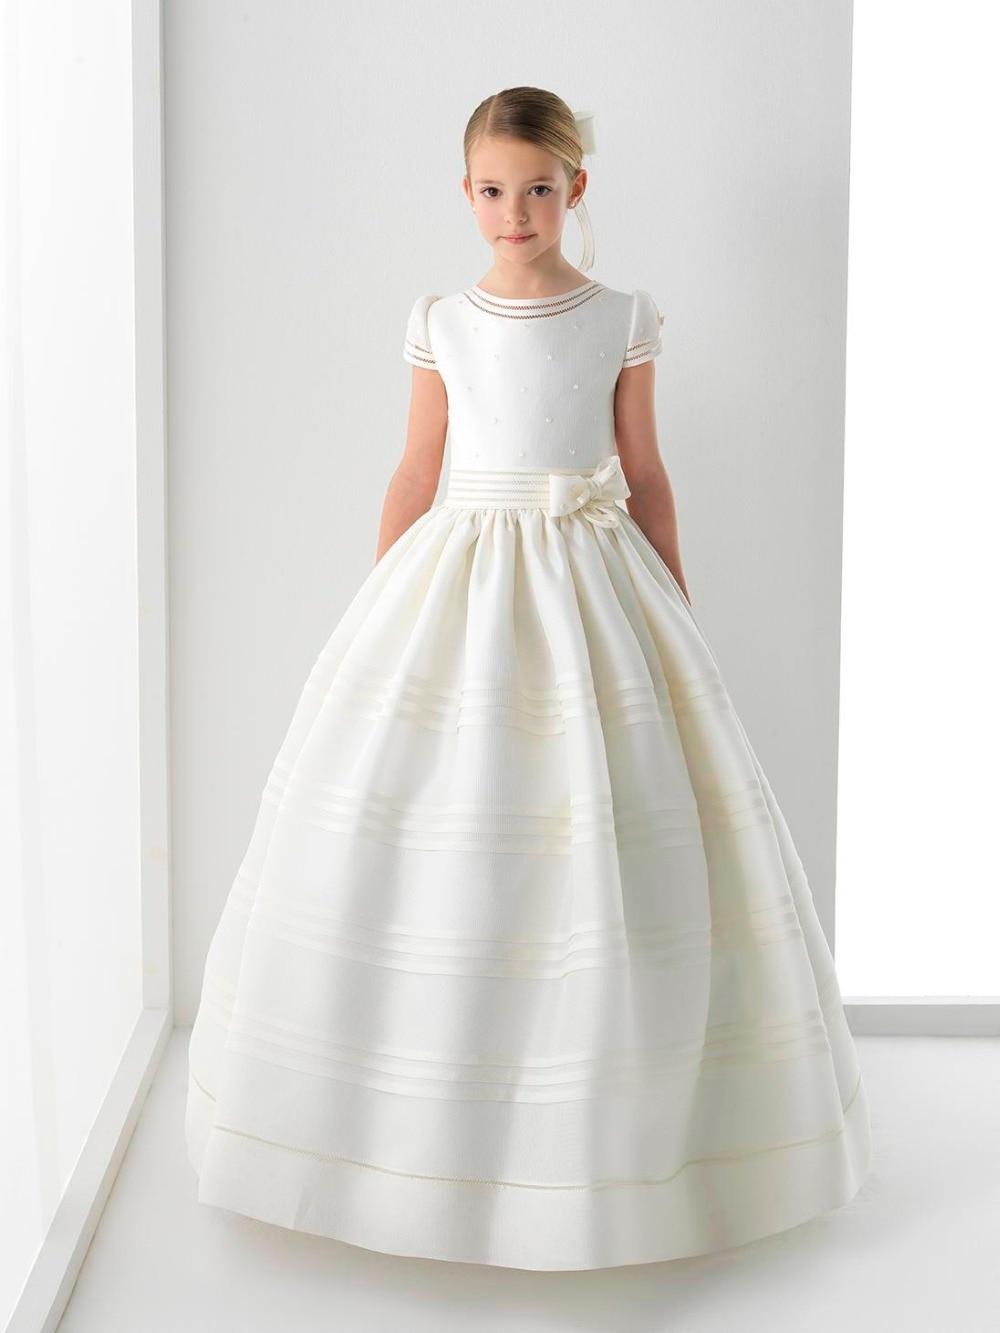 Aliexpress Com Buy 2017 New Fashion White Girls First